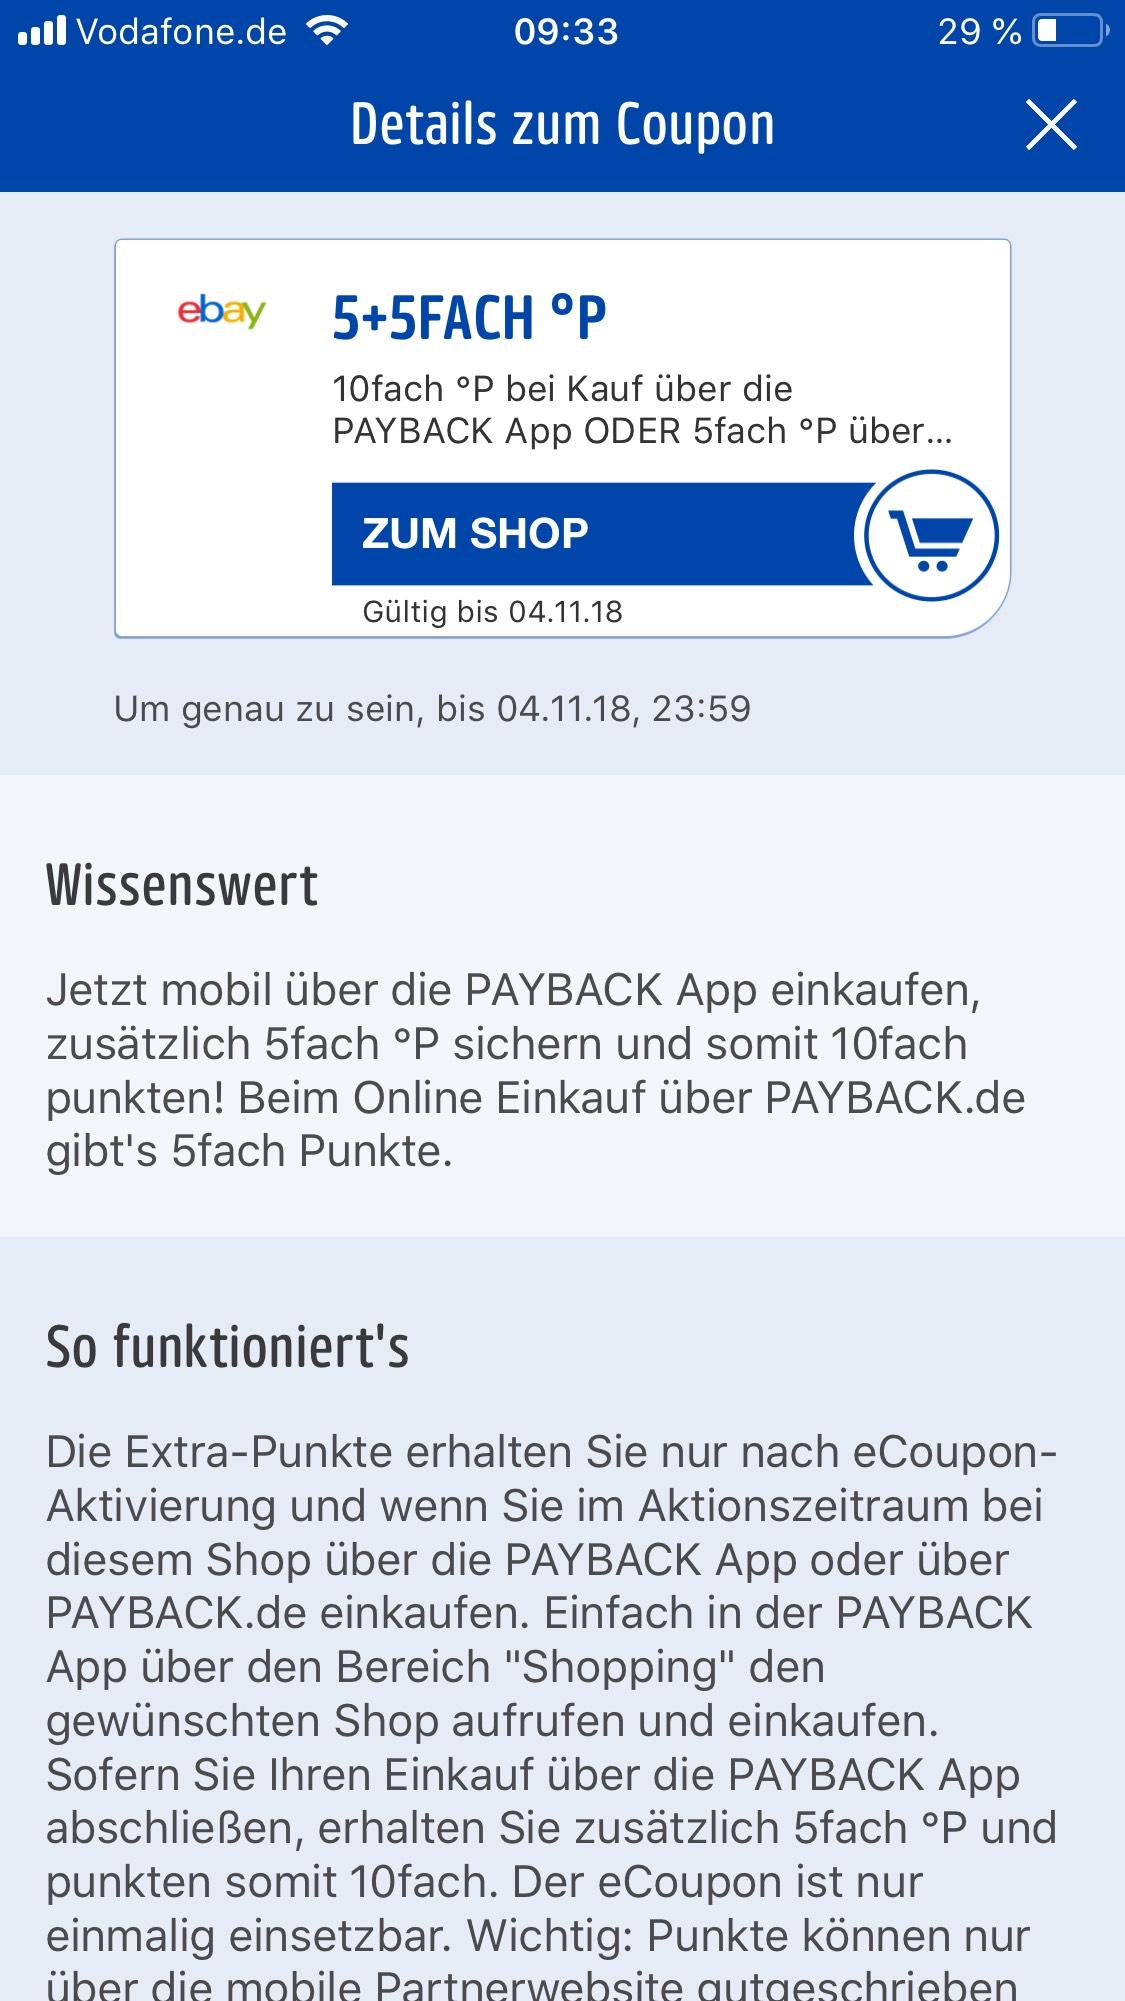 Ebay 10 Fach Payback Punkte [sofern per App]